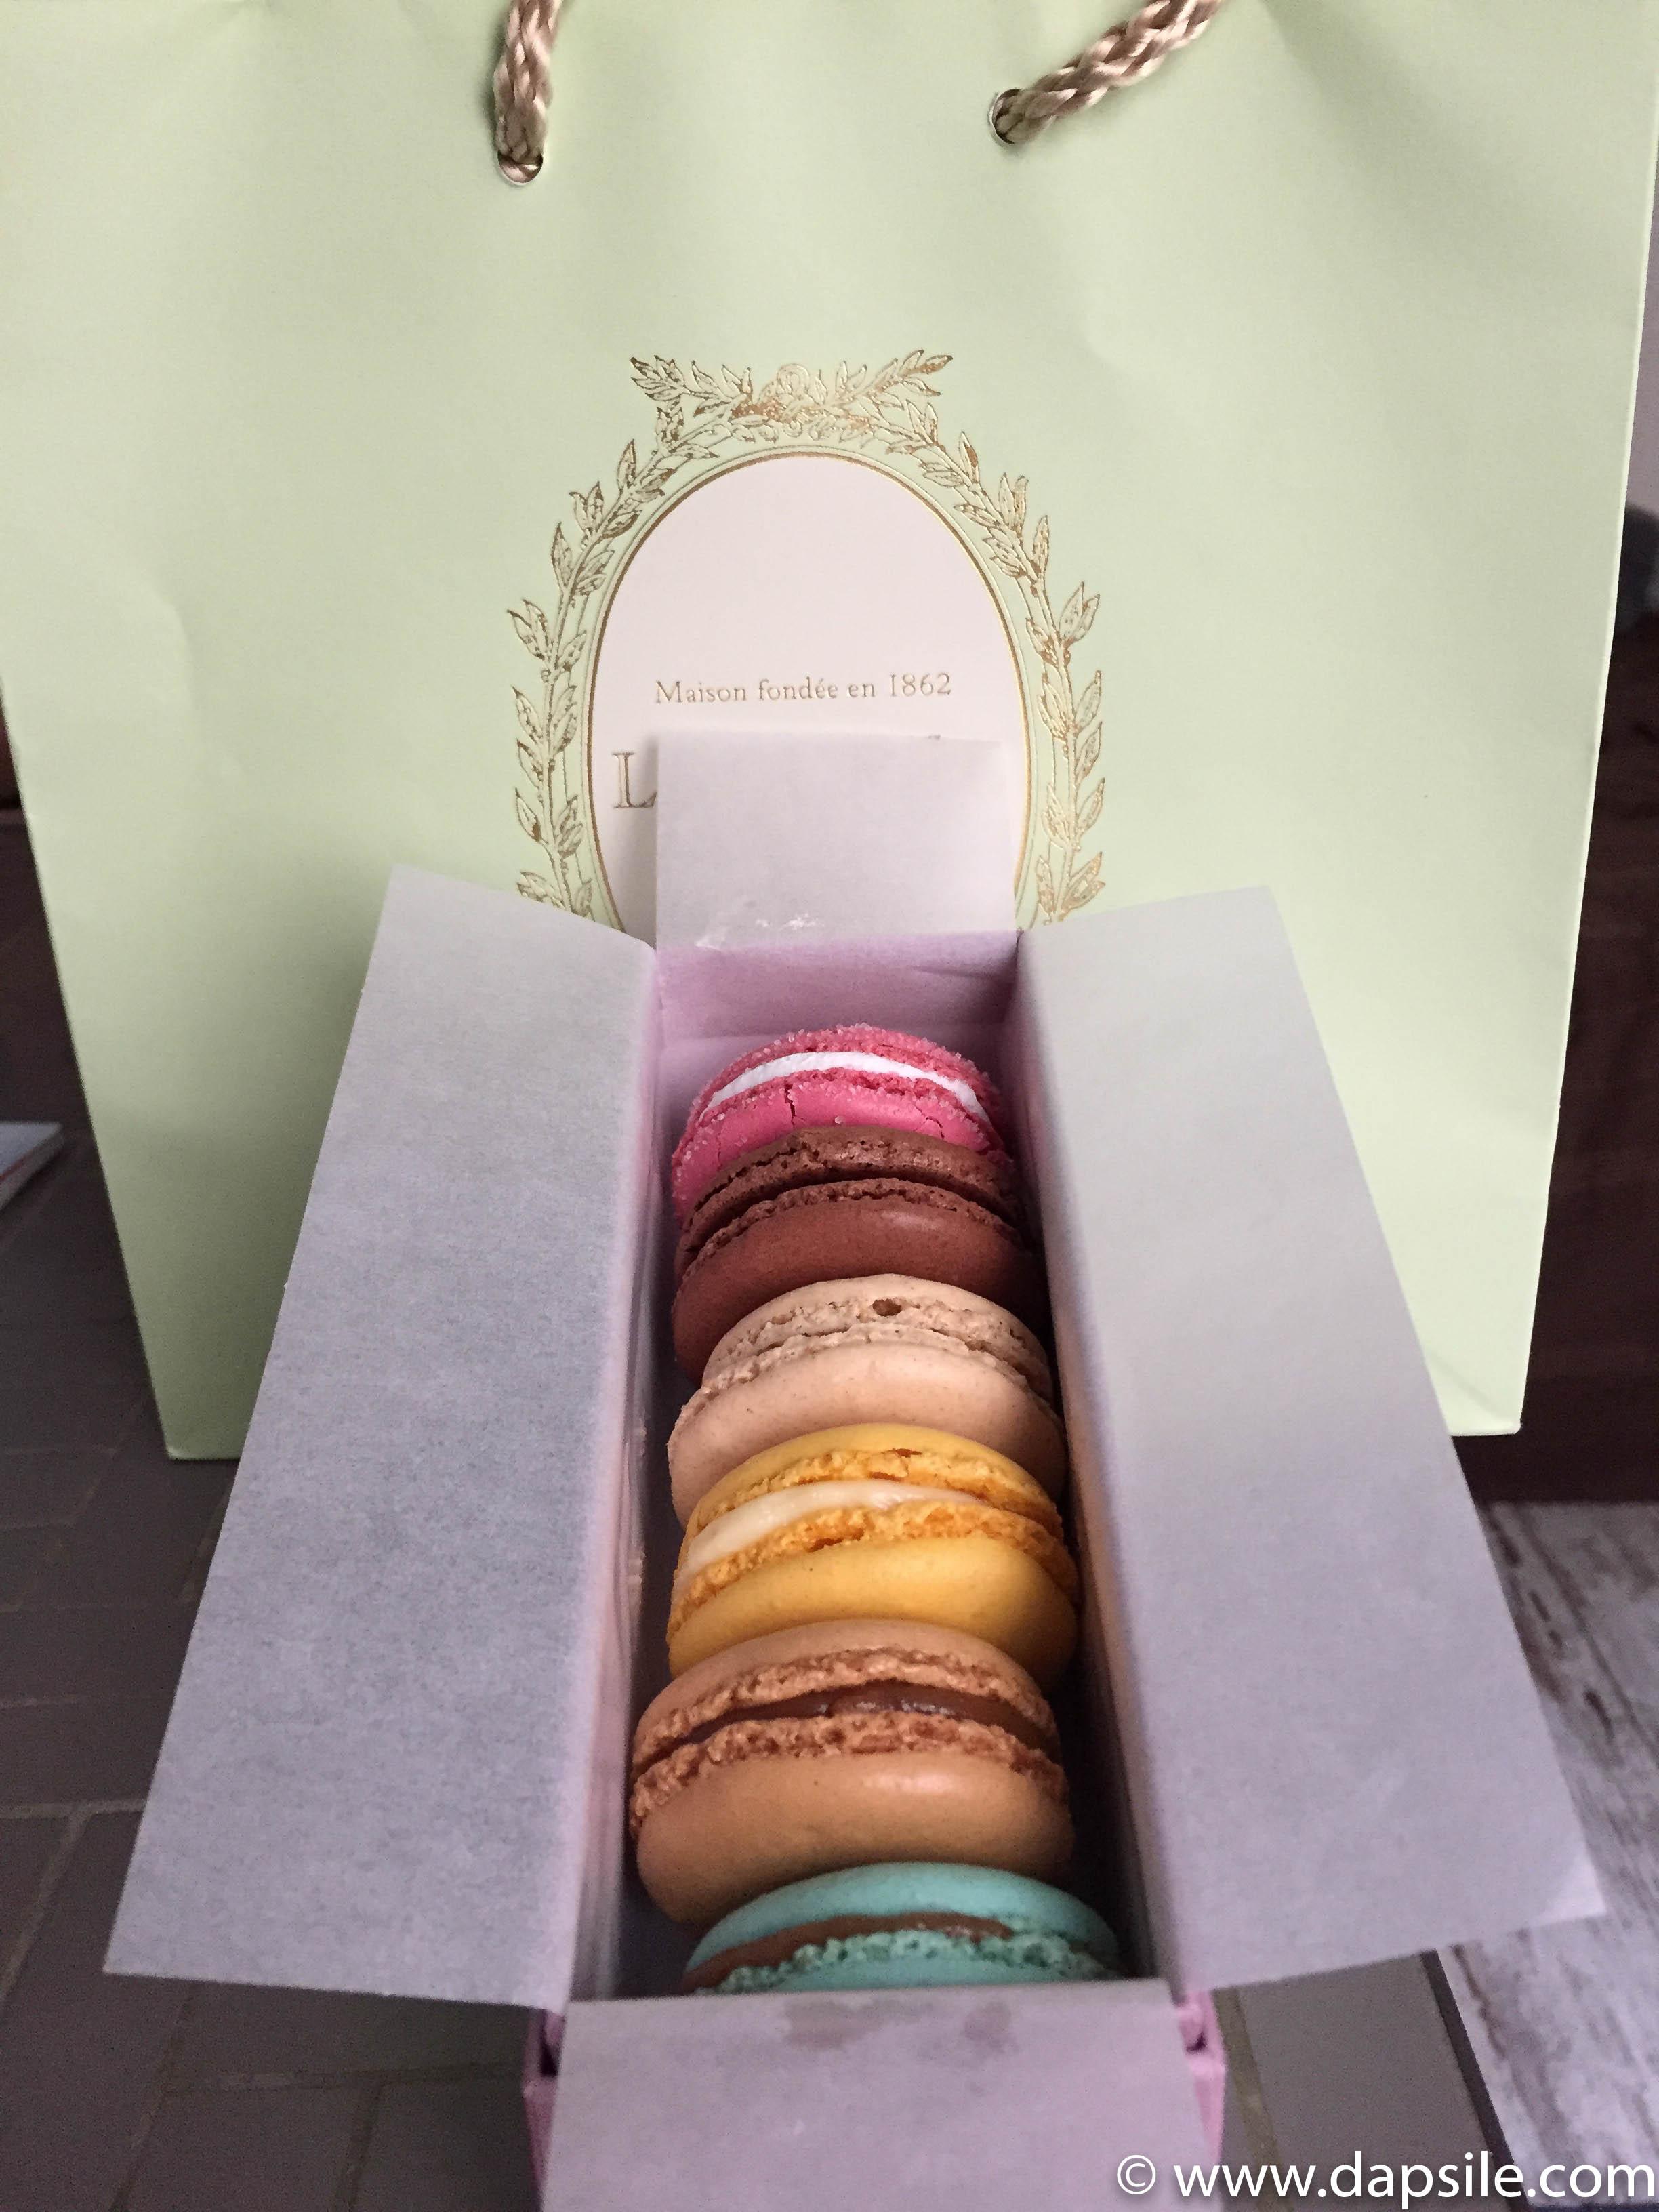 Laduree Macarons in Paris Sights